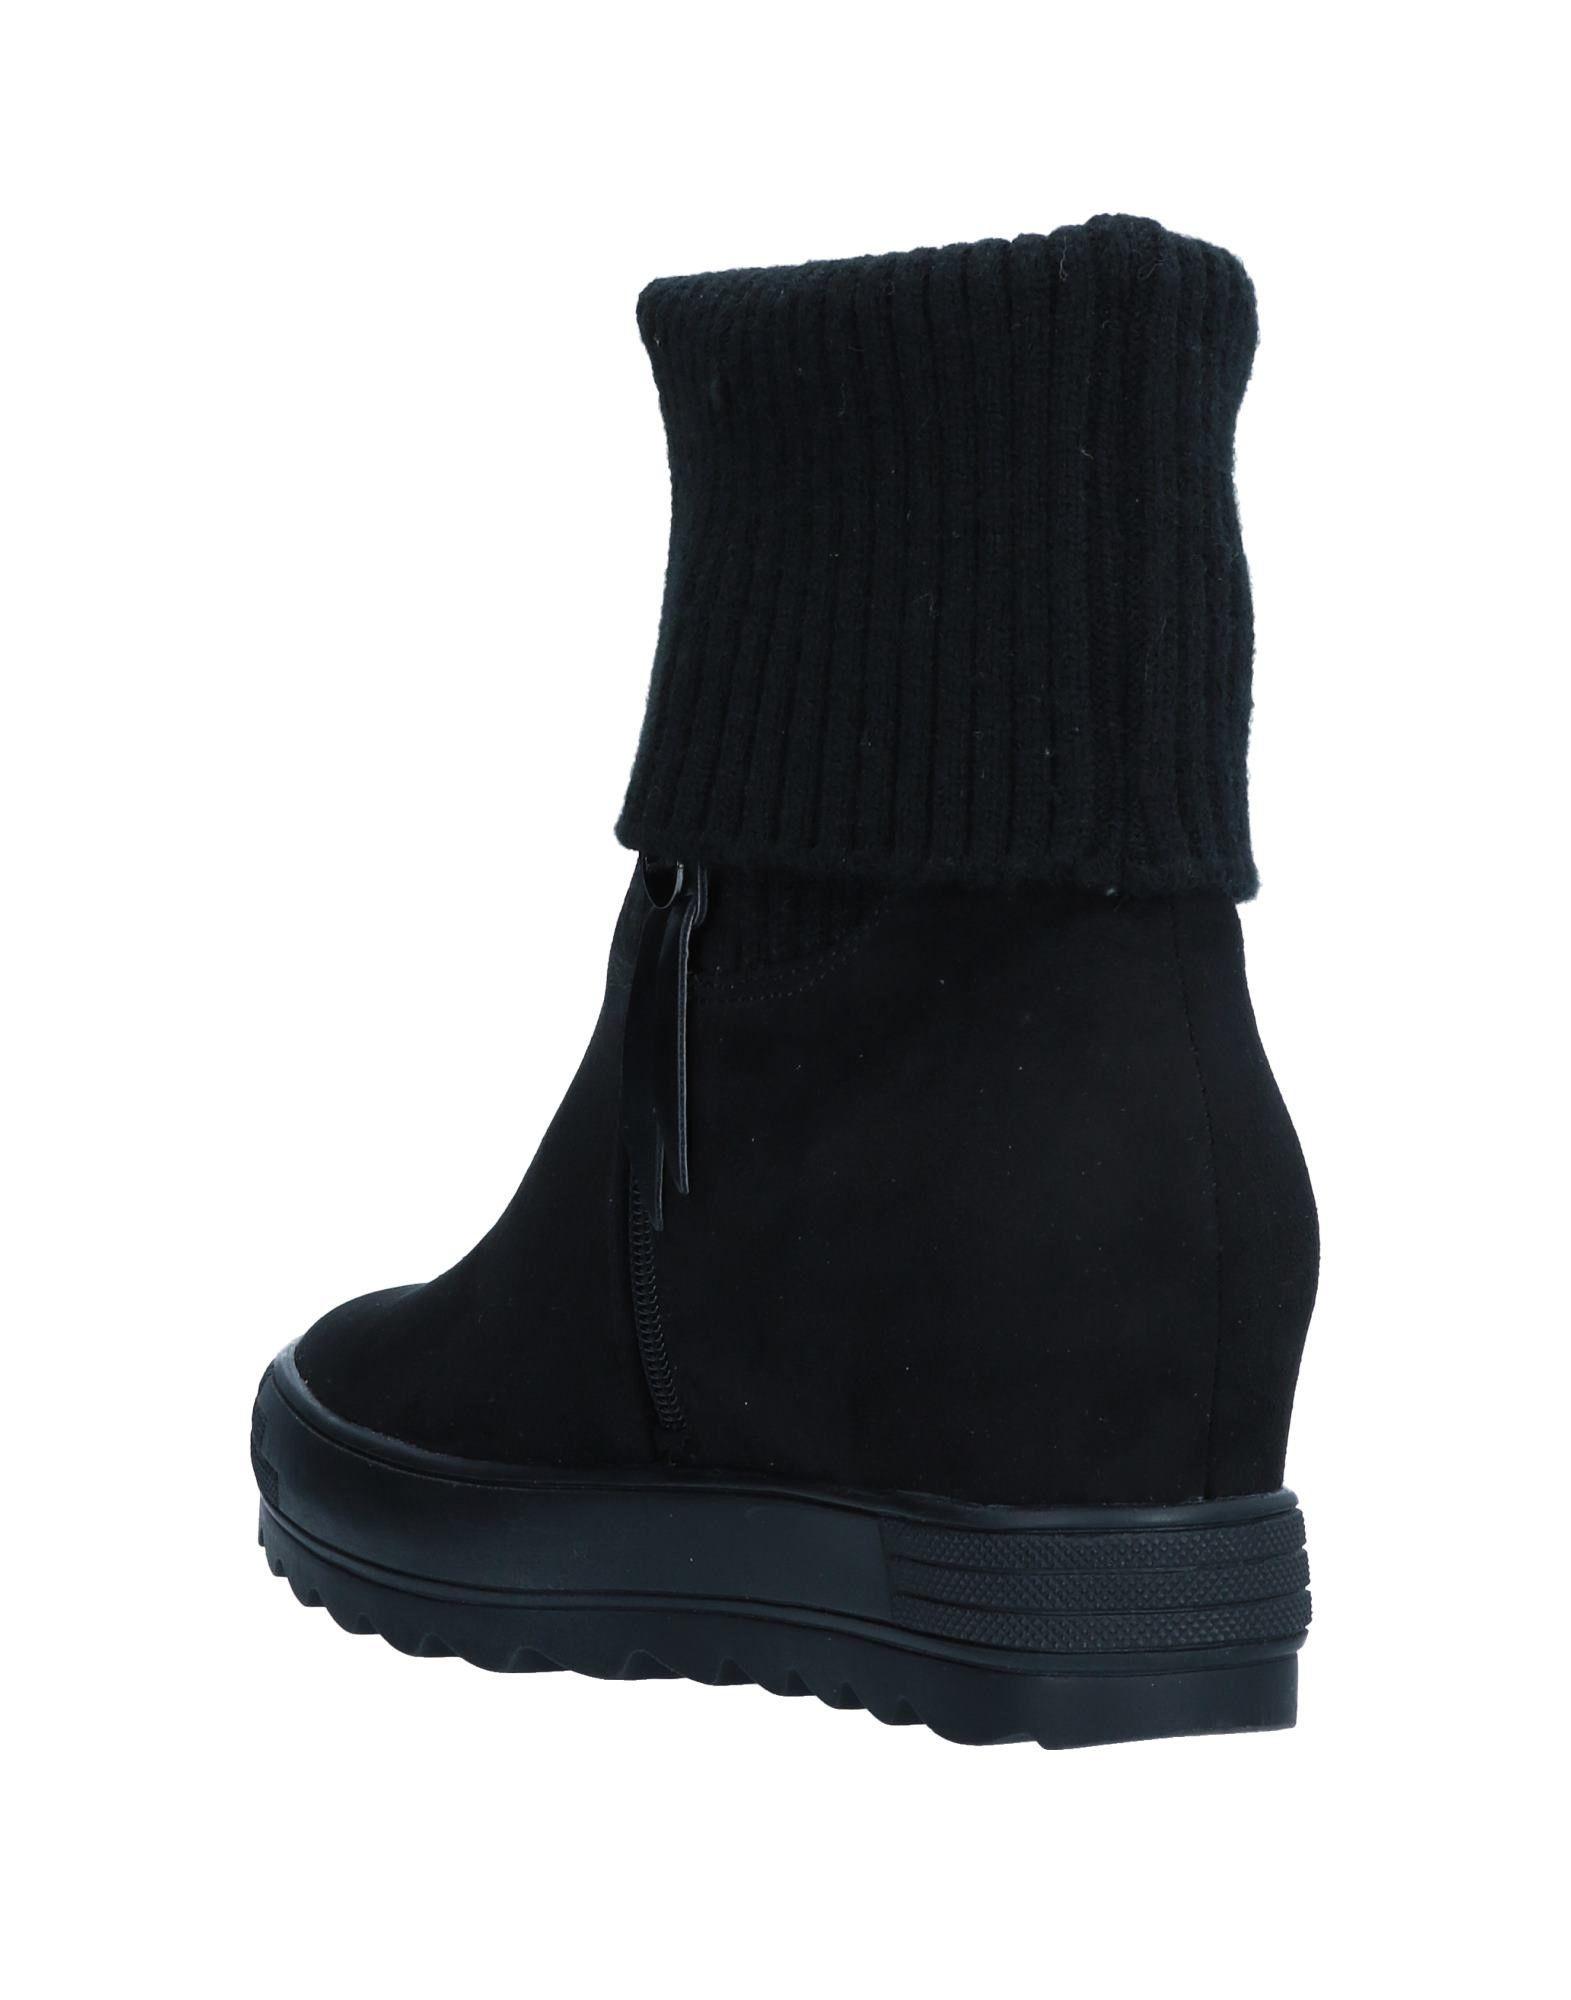 Braccialini Stiefelette Qualität Damen  11527014HD Gute Qualität Stiefelette beliebte Schuhe 7390b3